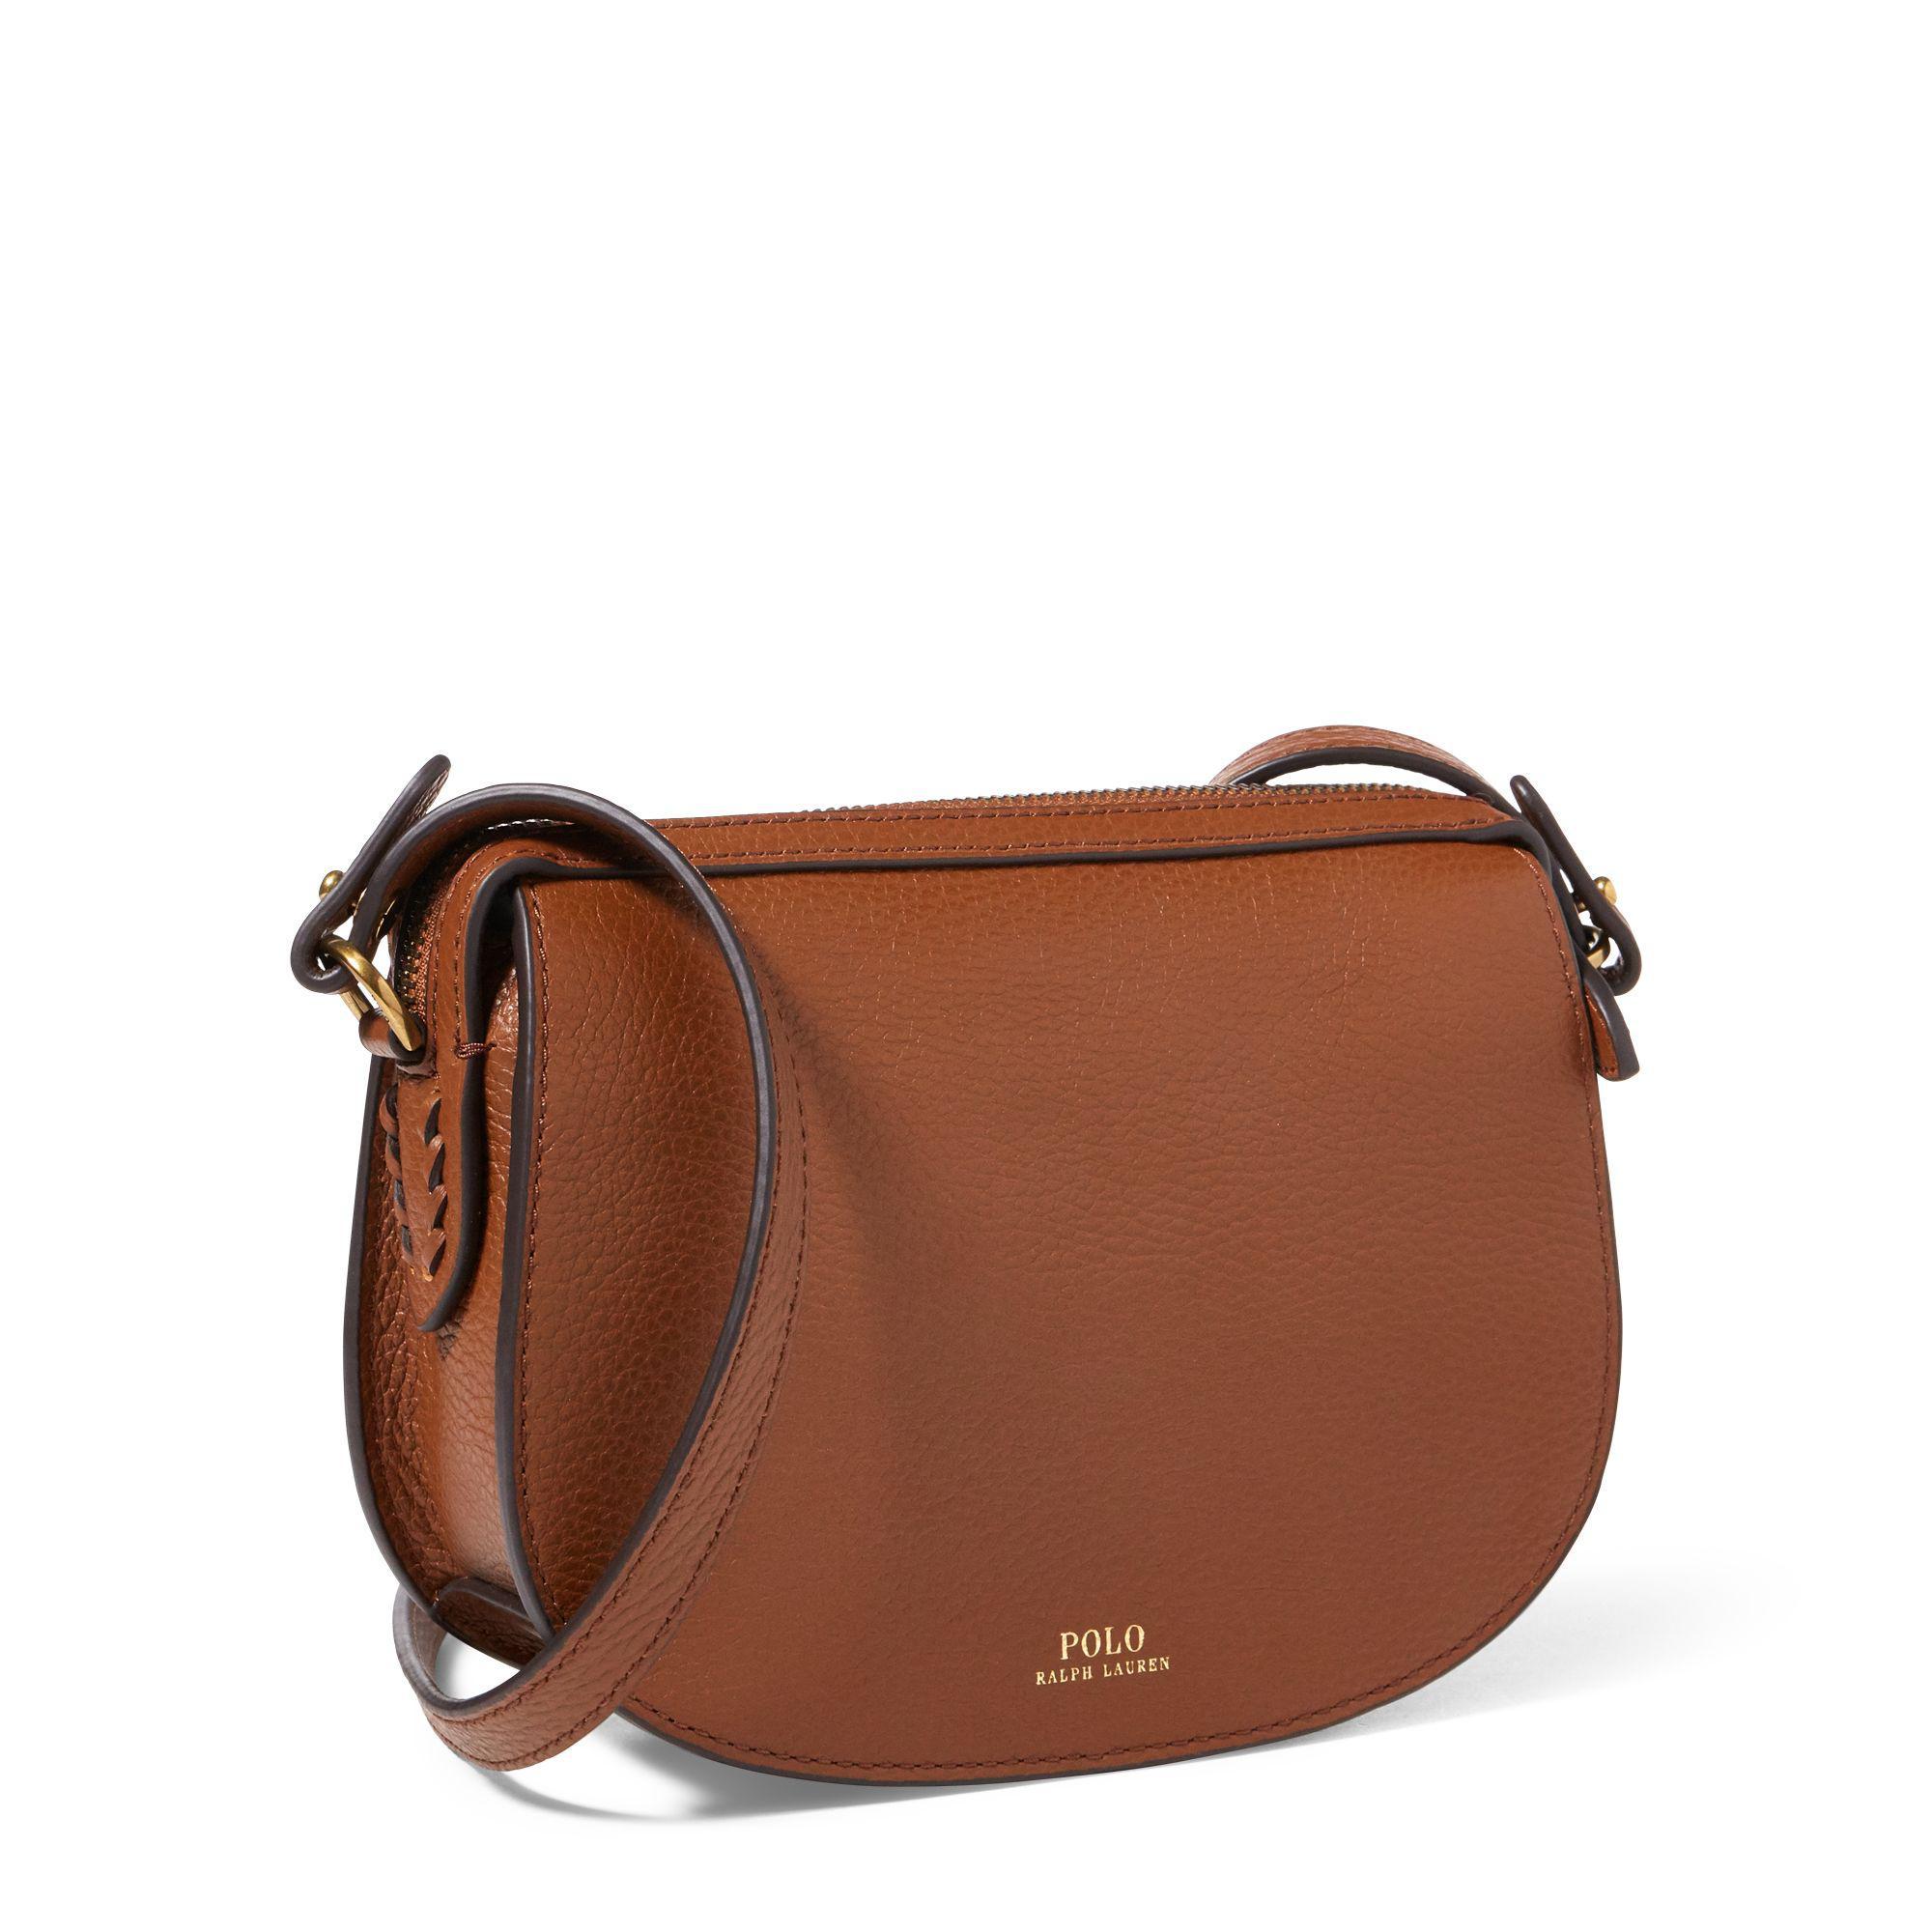 8c5d0d6cb030 ... uk polo ralph lauren leather mini crossbody bag in brown lyst 04577  f2ef1